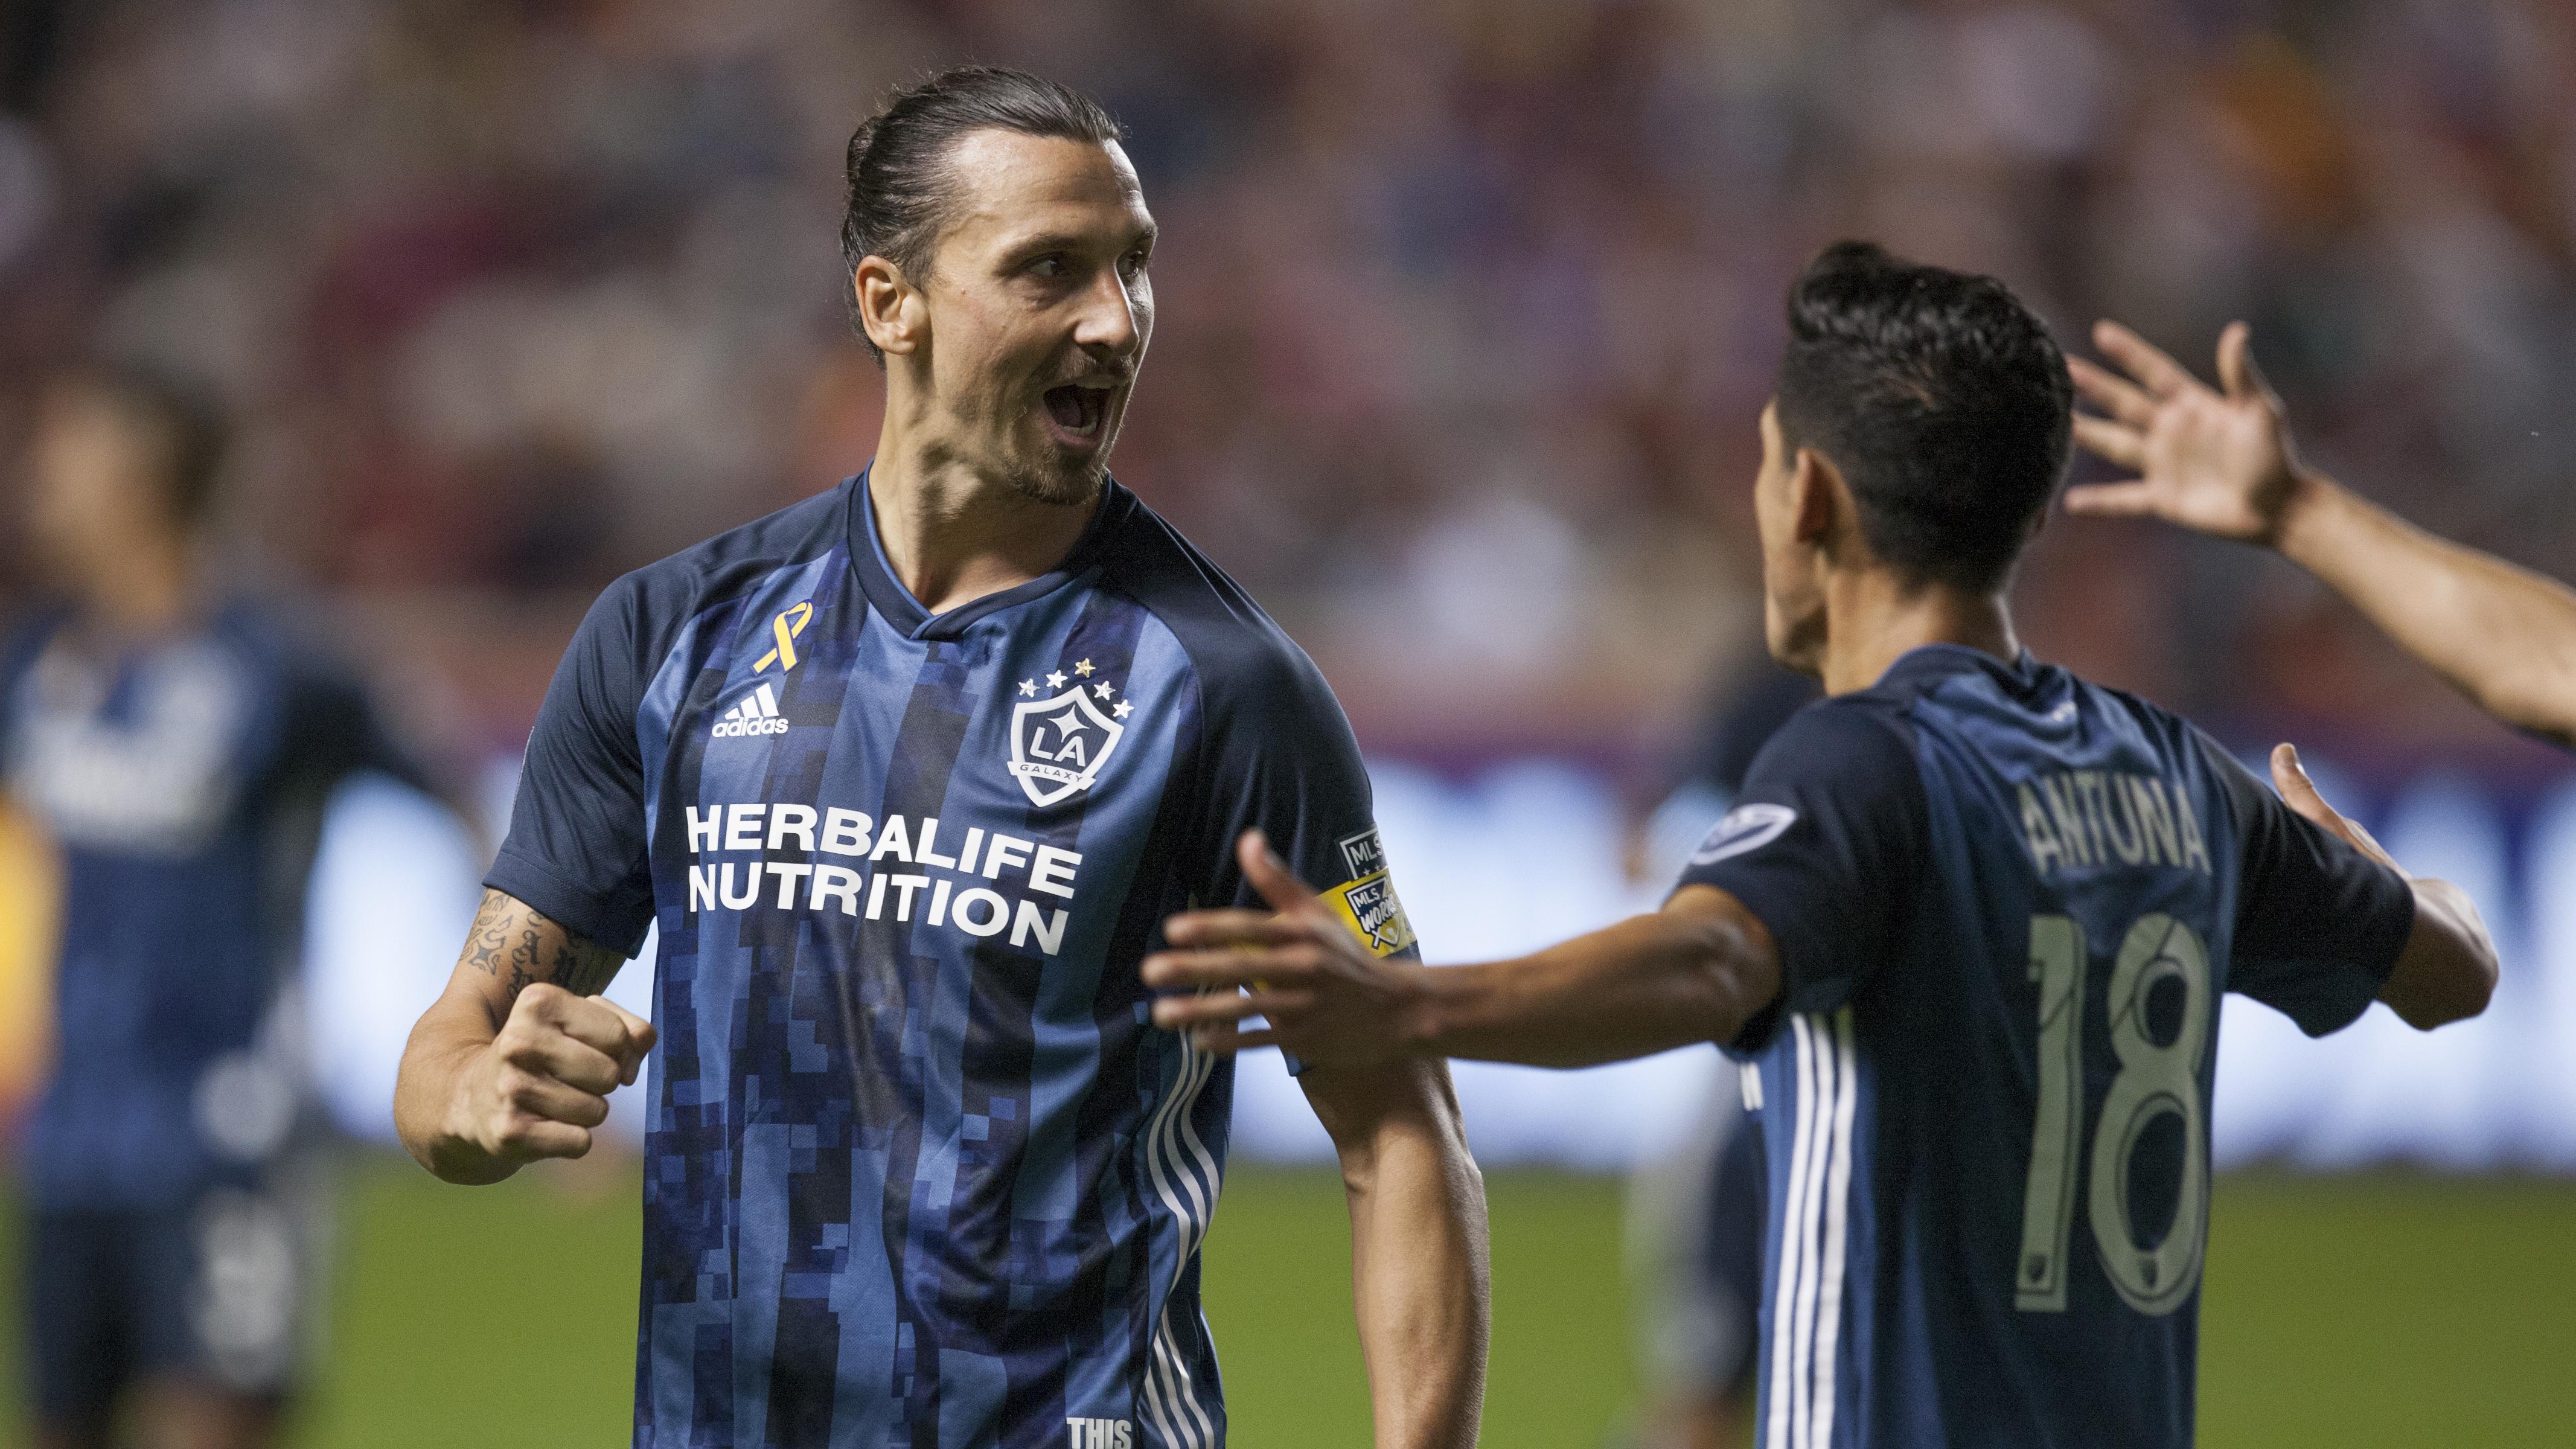 Galaxy star Zlatan Ibrahimovic's top five goals of 2019